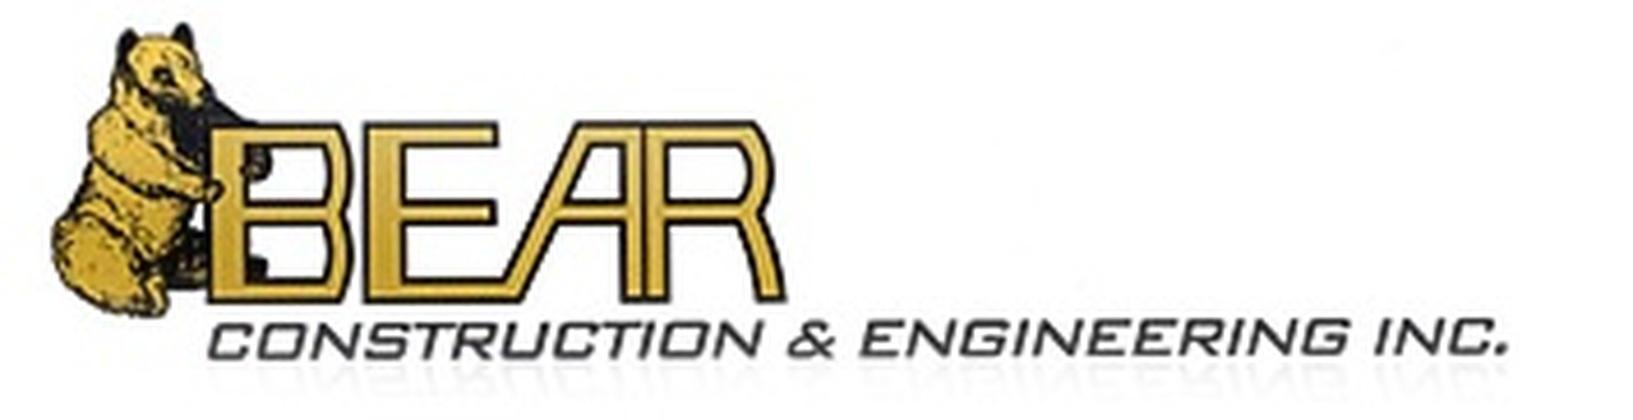 Bear Construction & Engineering Inc.